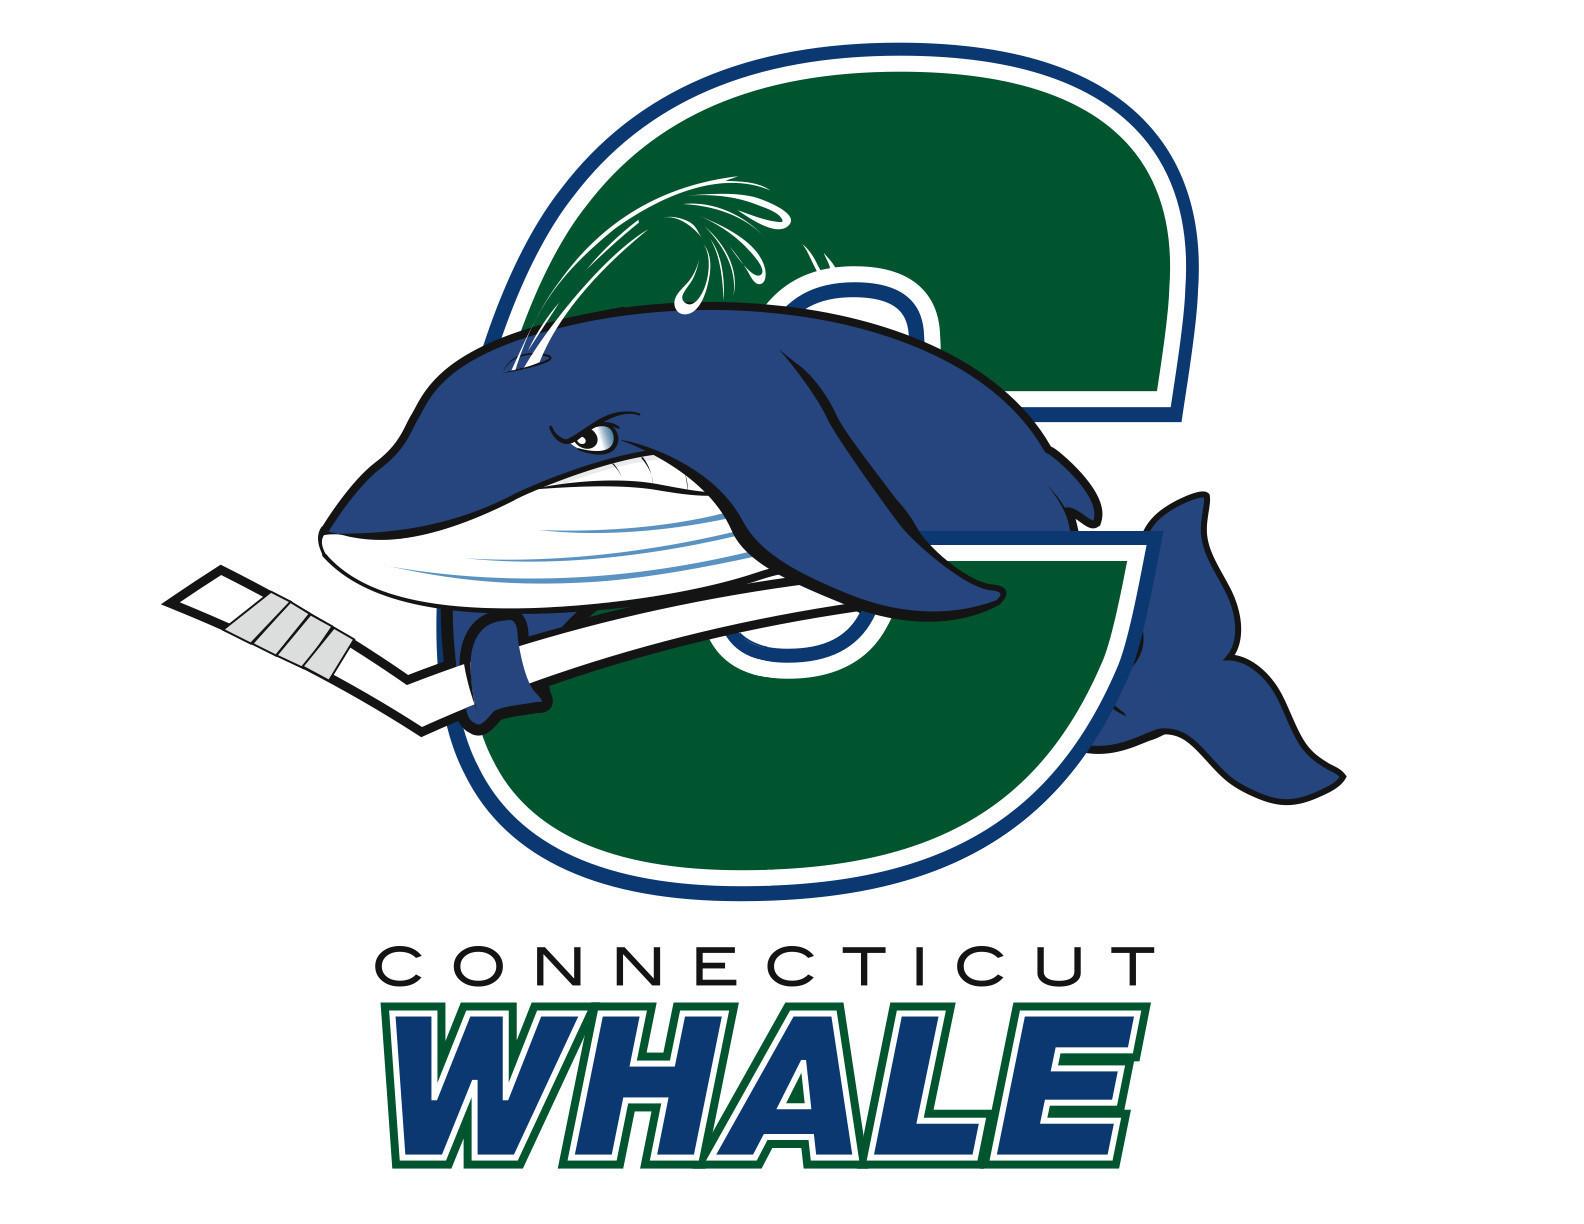 Connecticut whale returns as a women s hockey team hartford